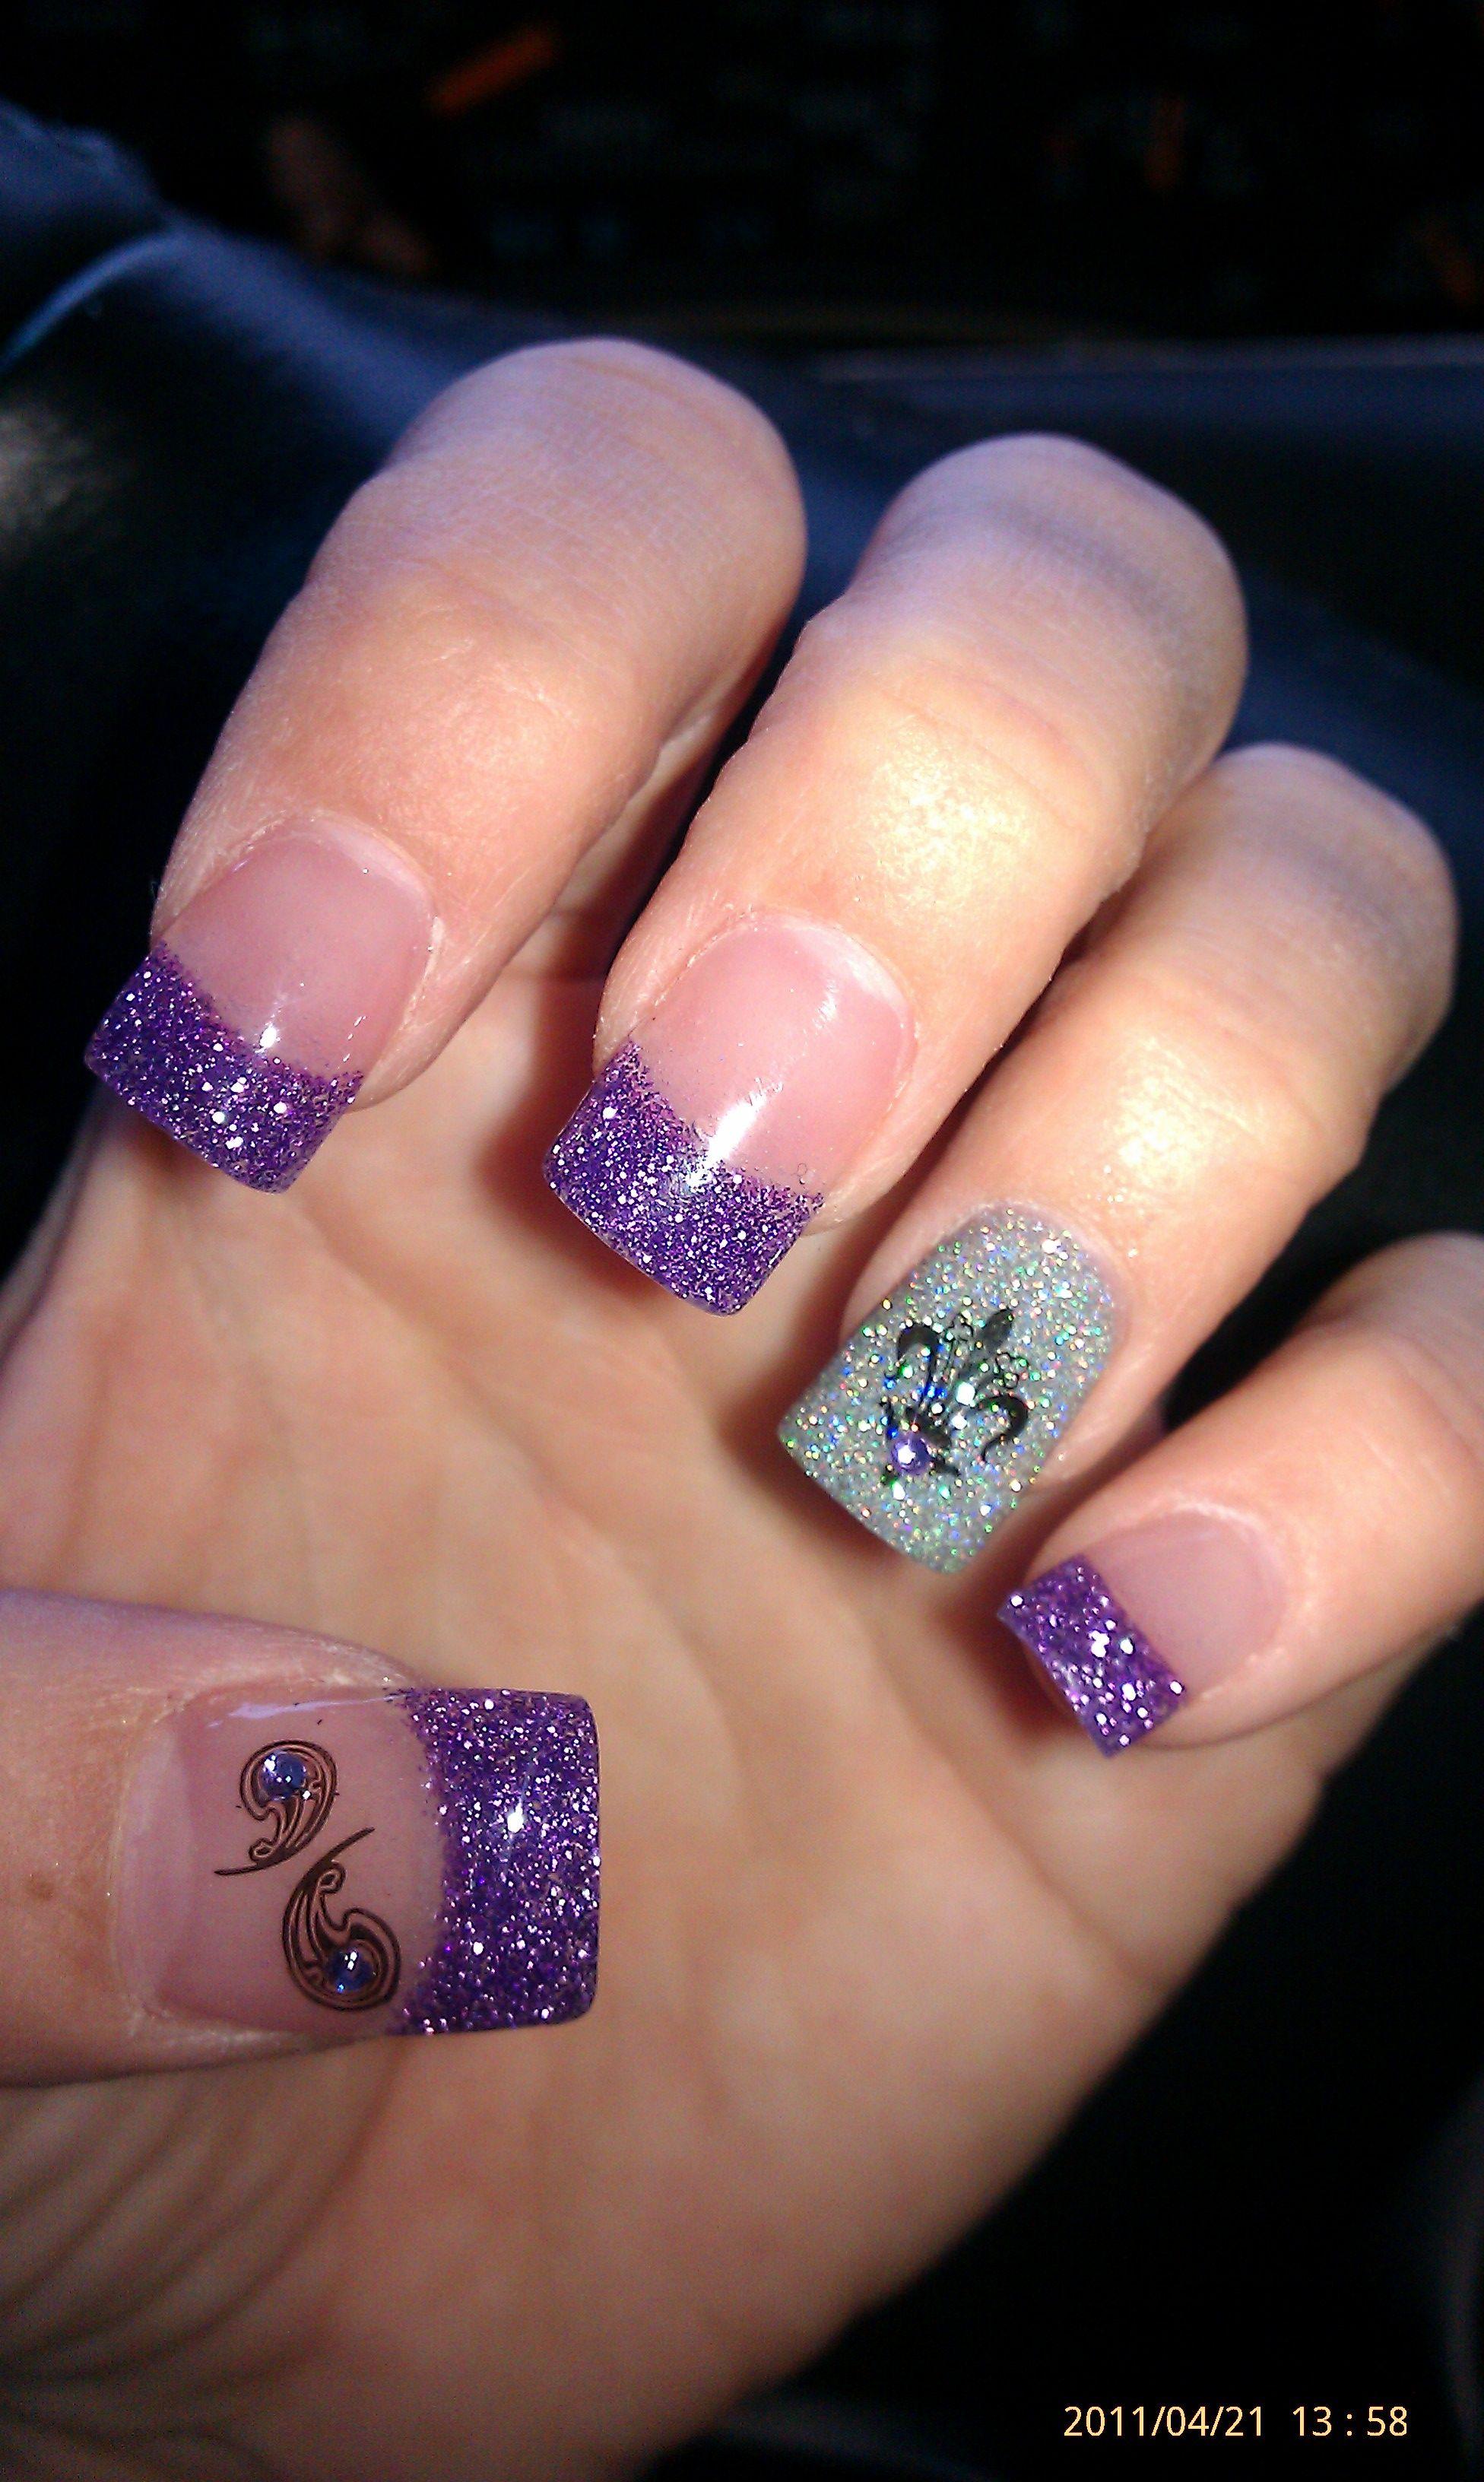 purple glitter, fluer de lis konad stamp art with rhinestone under silver glitter on ring finger, paisley konad stamp w/ jewel on thumb...